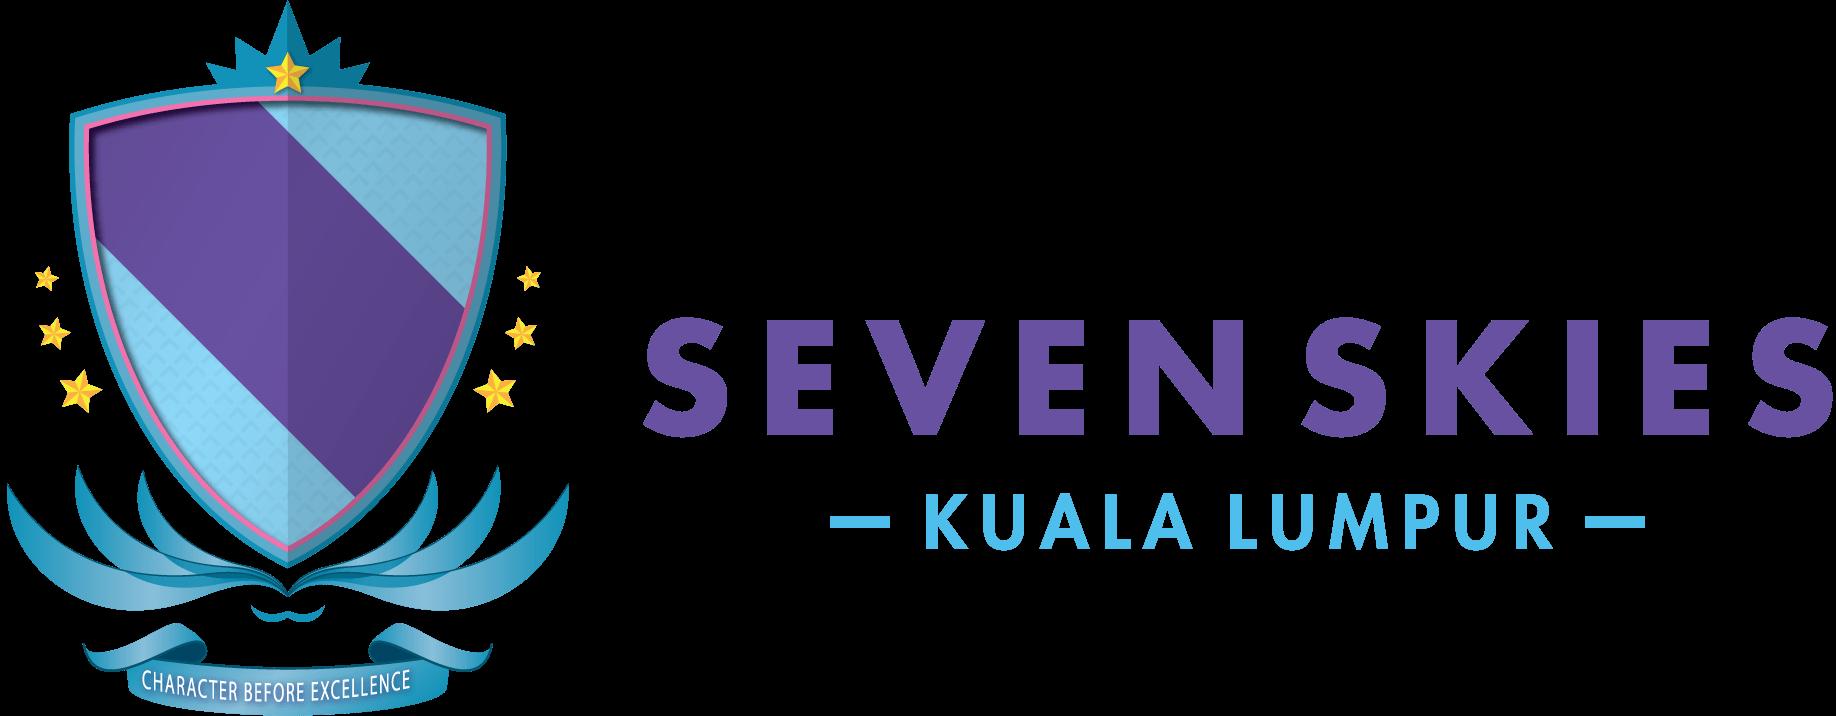 Seven Skies Islamic International School